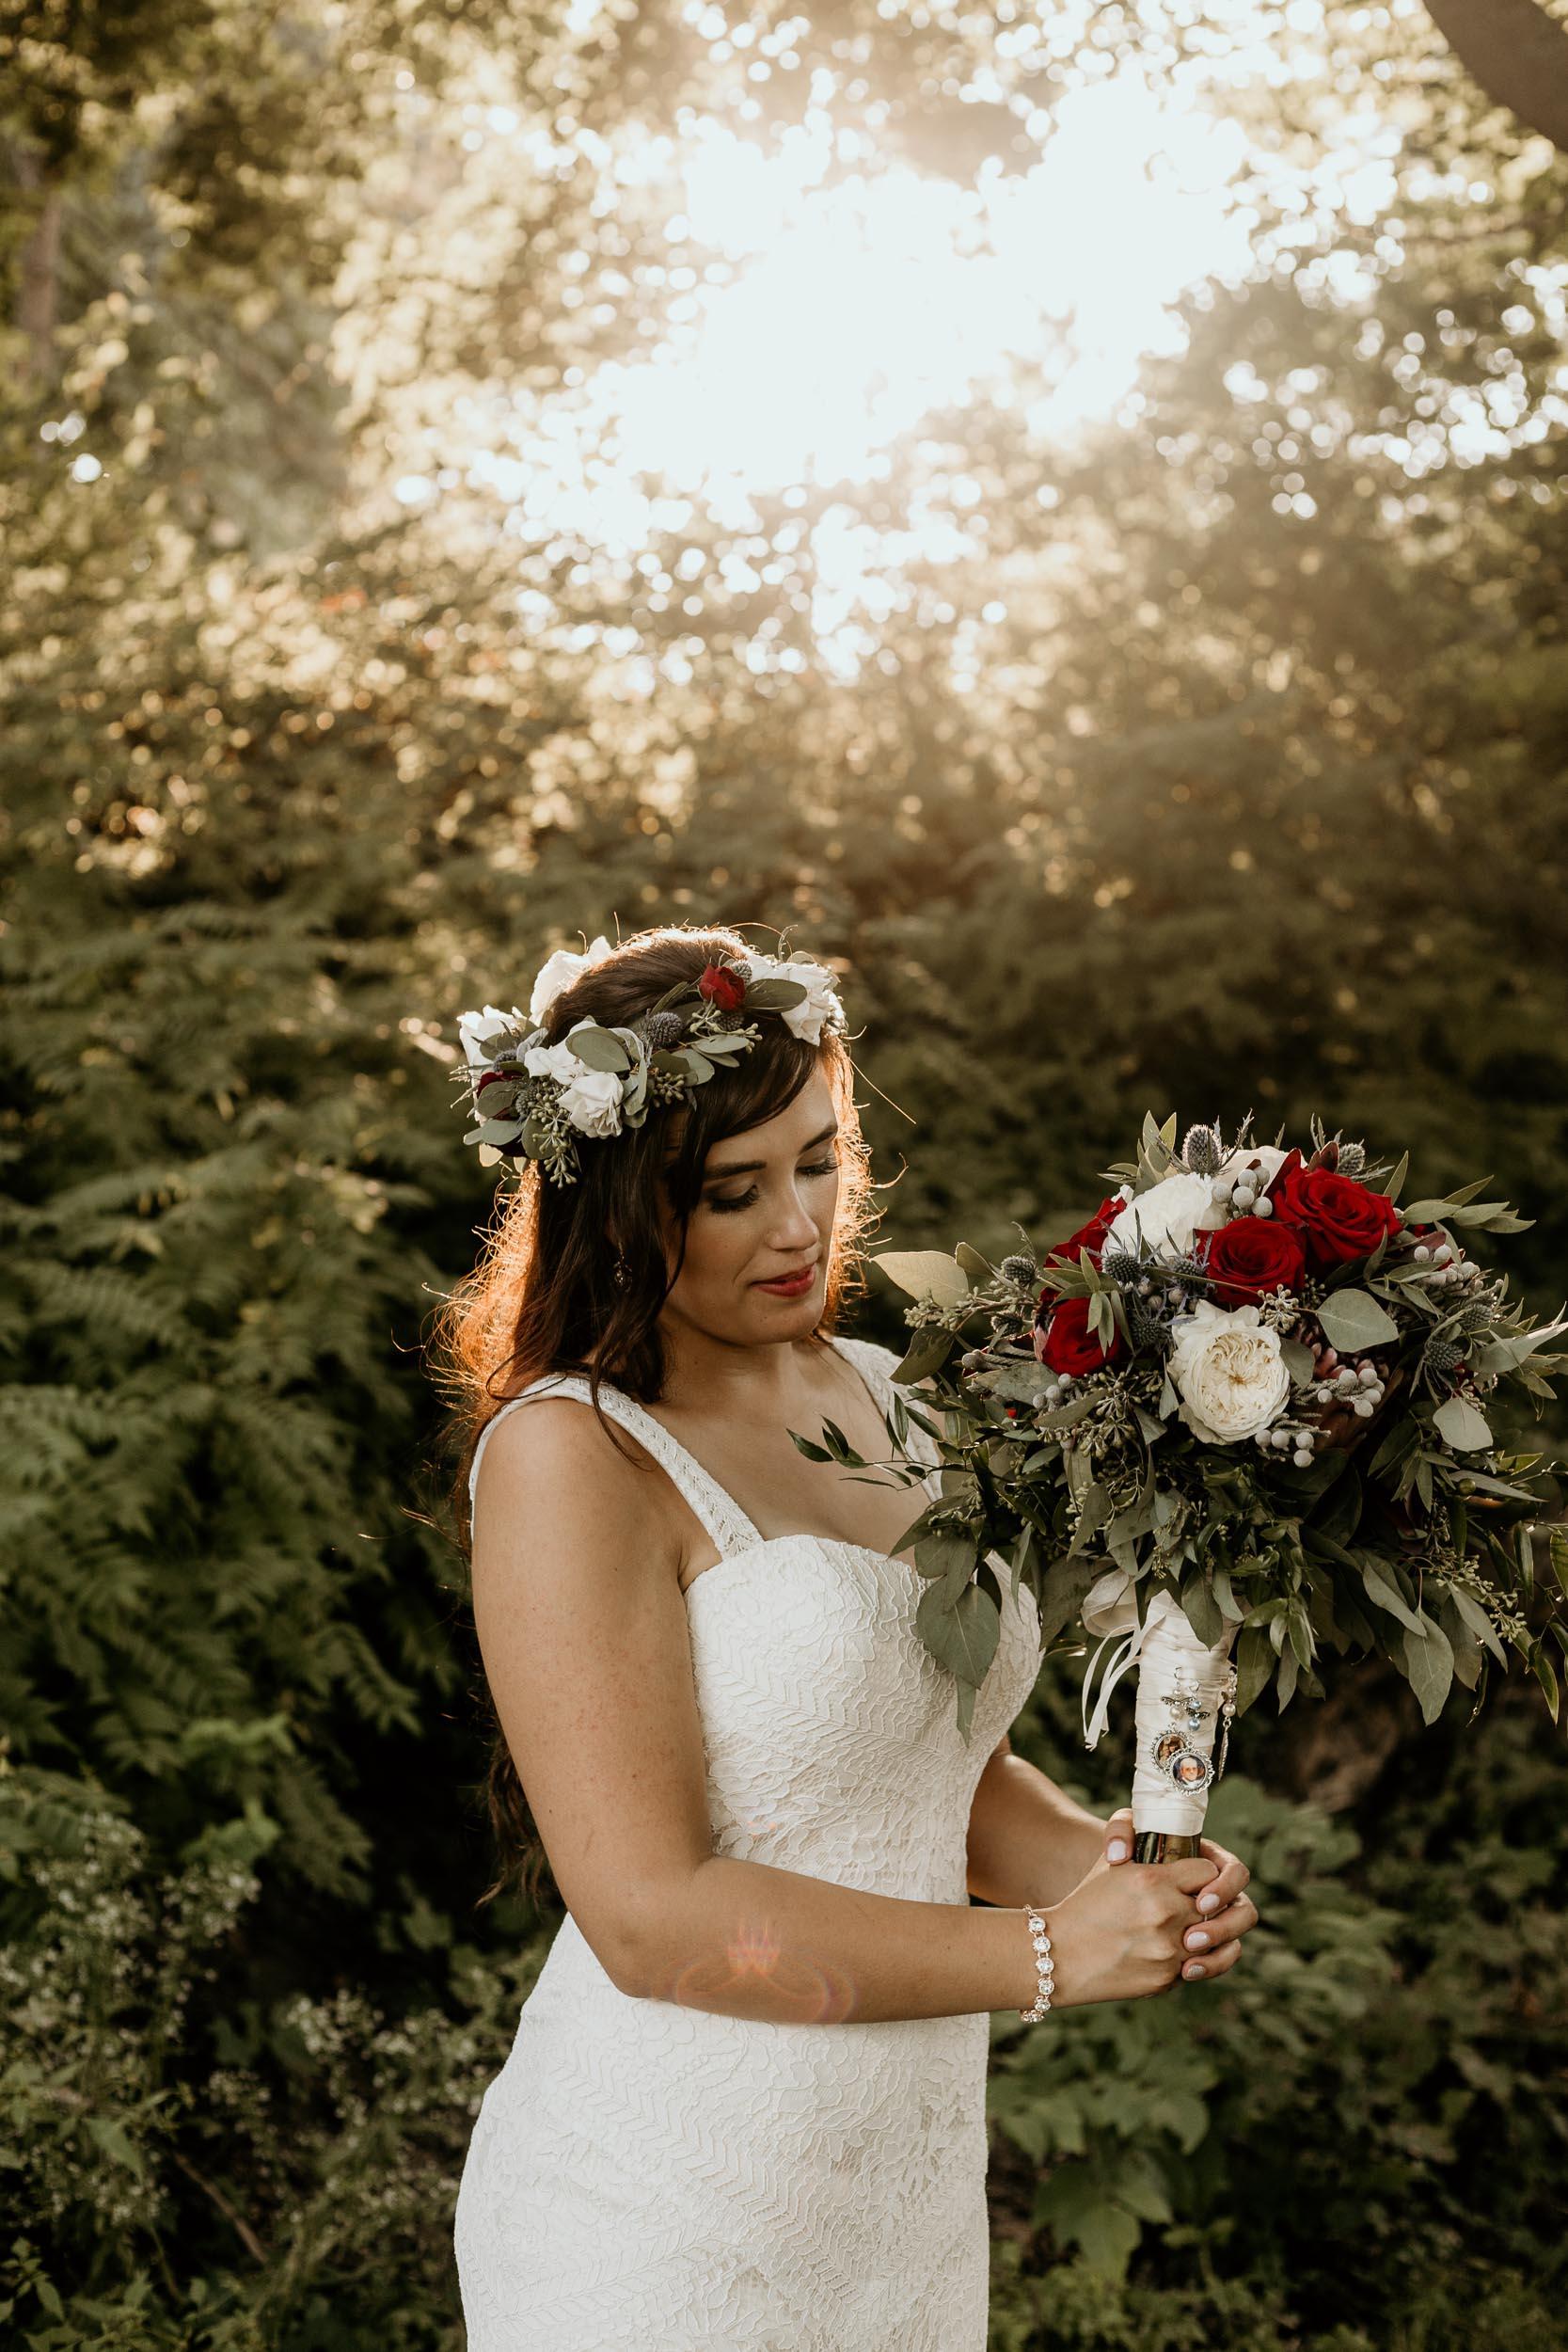 intimate-wedding-elopement-photographer-ottawa-toronto-7993.jpg